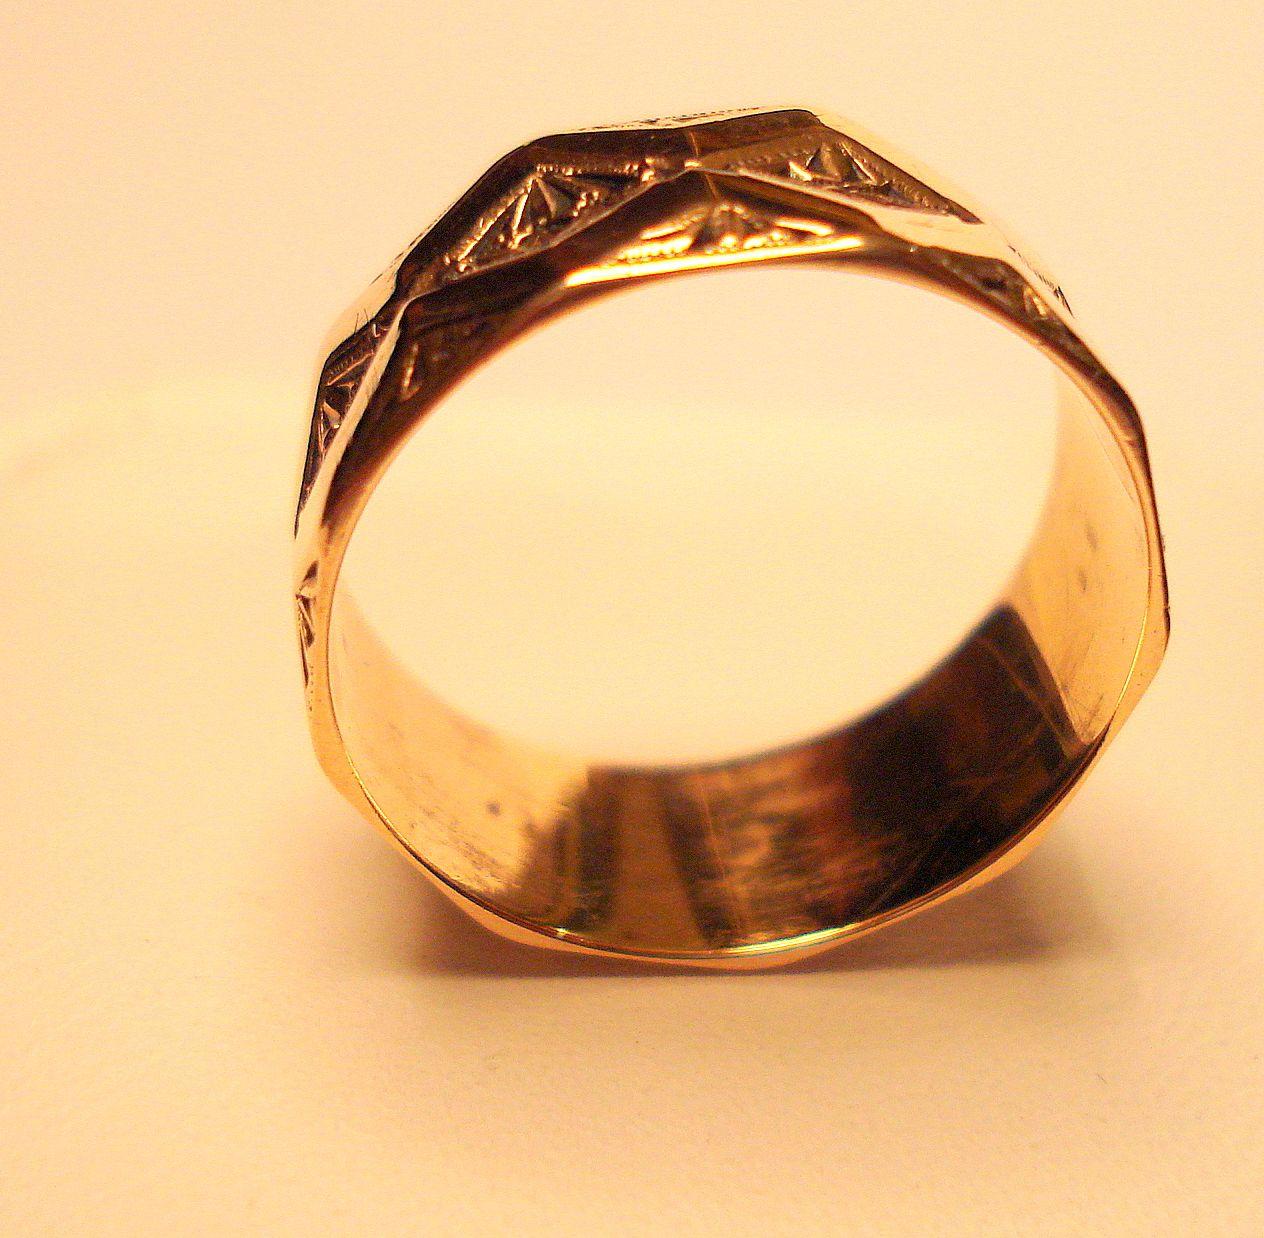 New Civil Wedding Rings With Pre Civil War Circa 1850 18 Karat